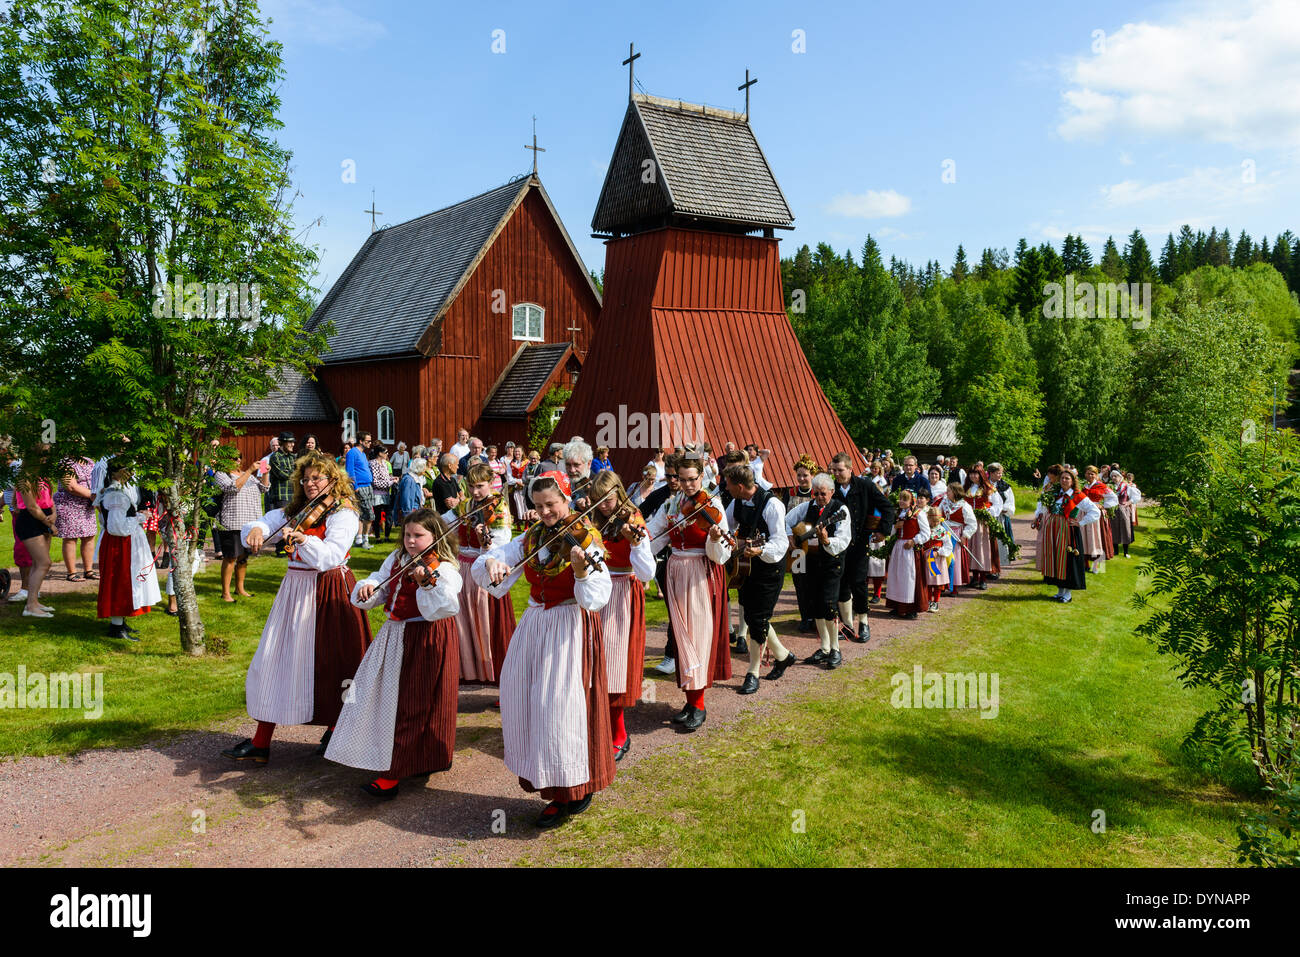 People celebrating midsummer festival, Evertsberg, Dalarna, Sweden Stock Photo